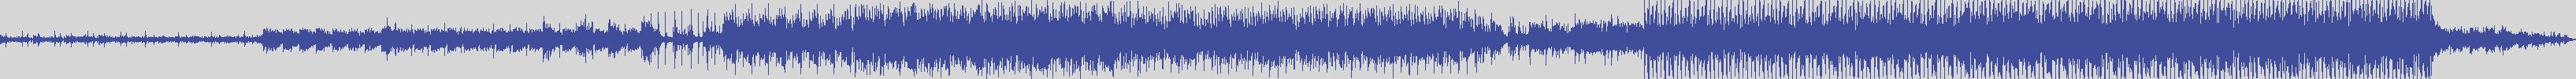 worldwide_music_records [WMR002] Difetti Sonori - Record in Tokio [Original Mix] audio wave form